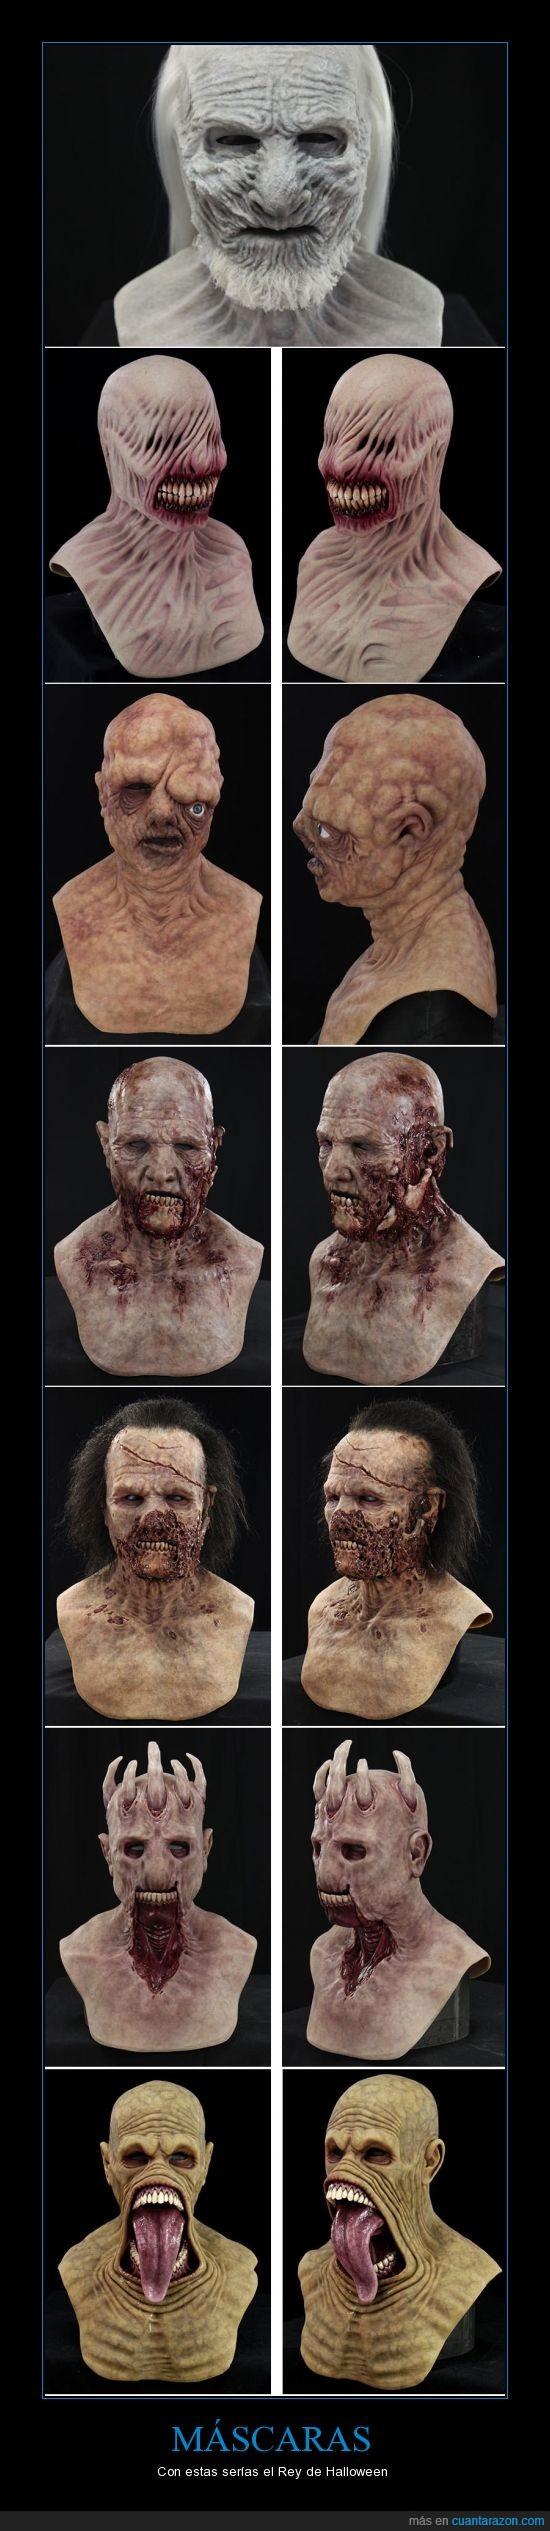 asombrosos diseños,Halloween te invoco YA!,mascaras,otro,reales,white walker,zombie